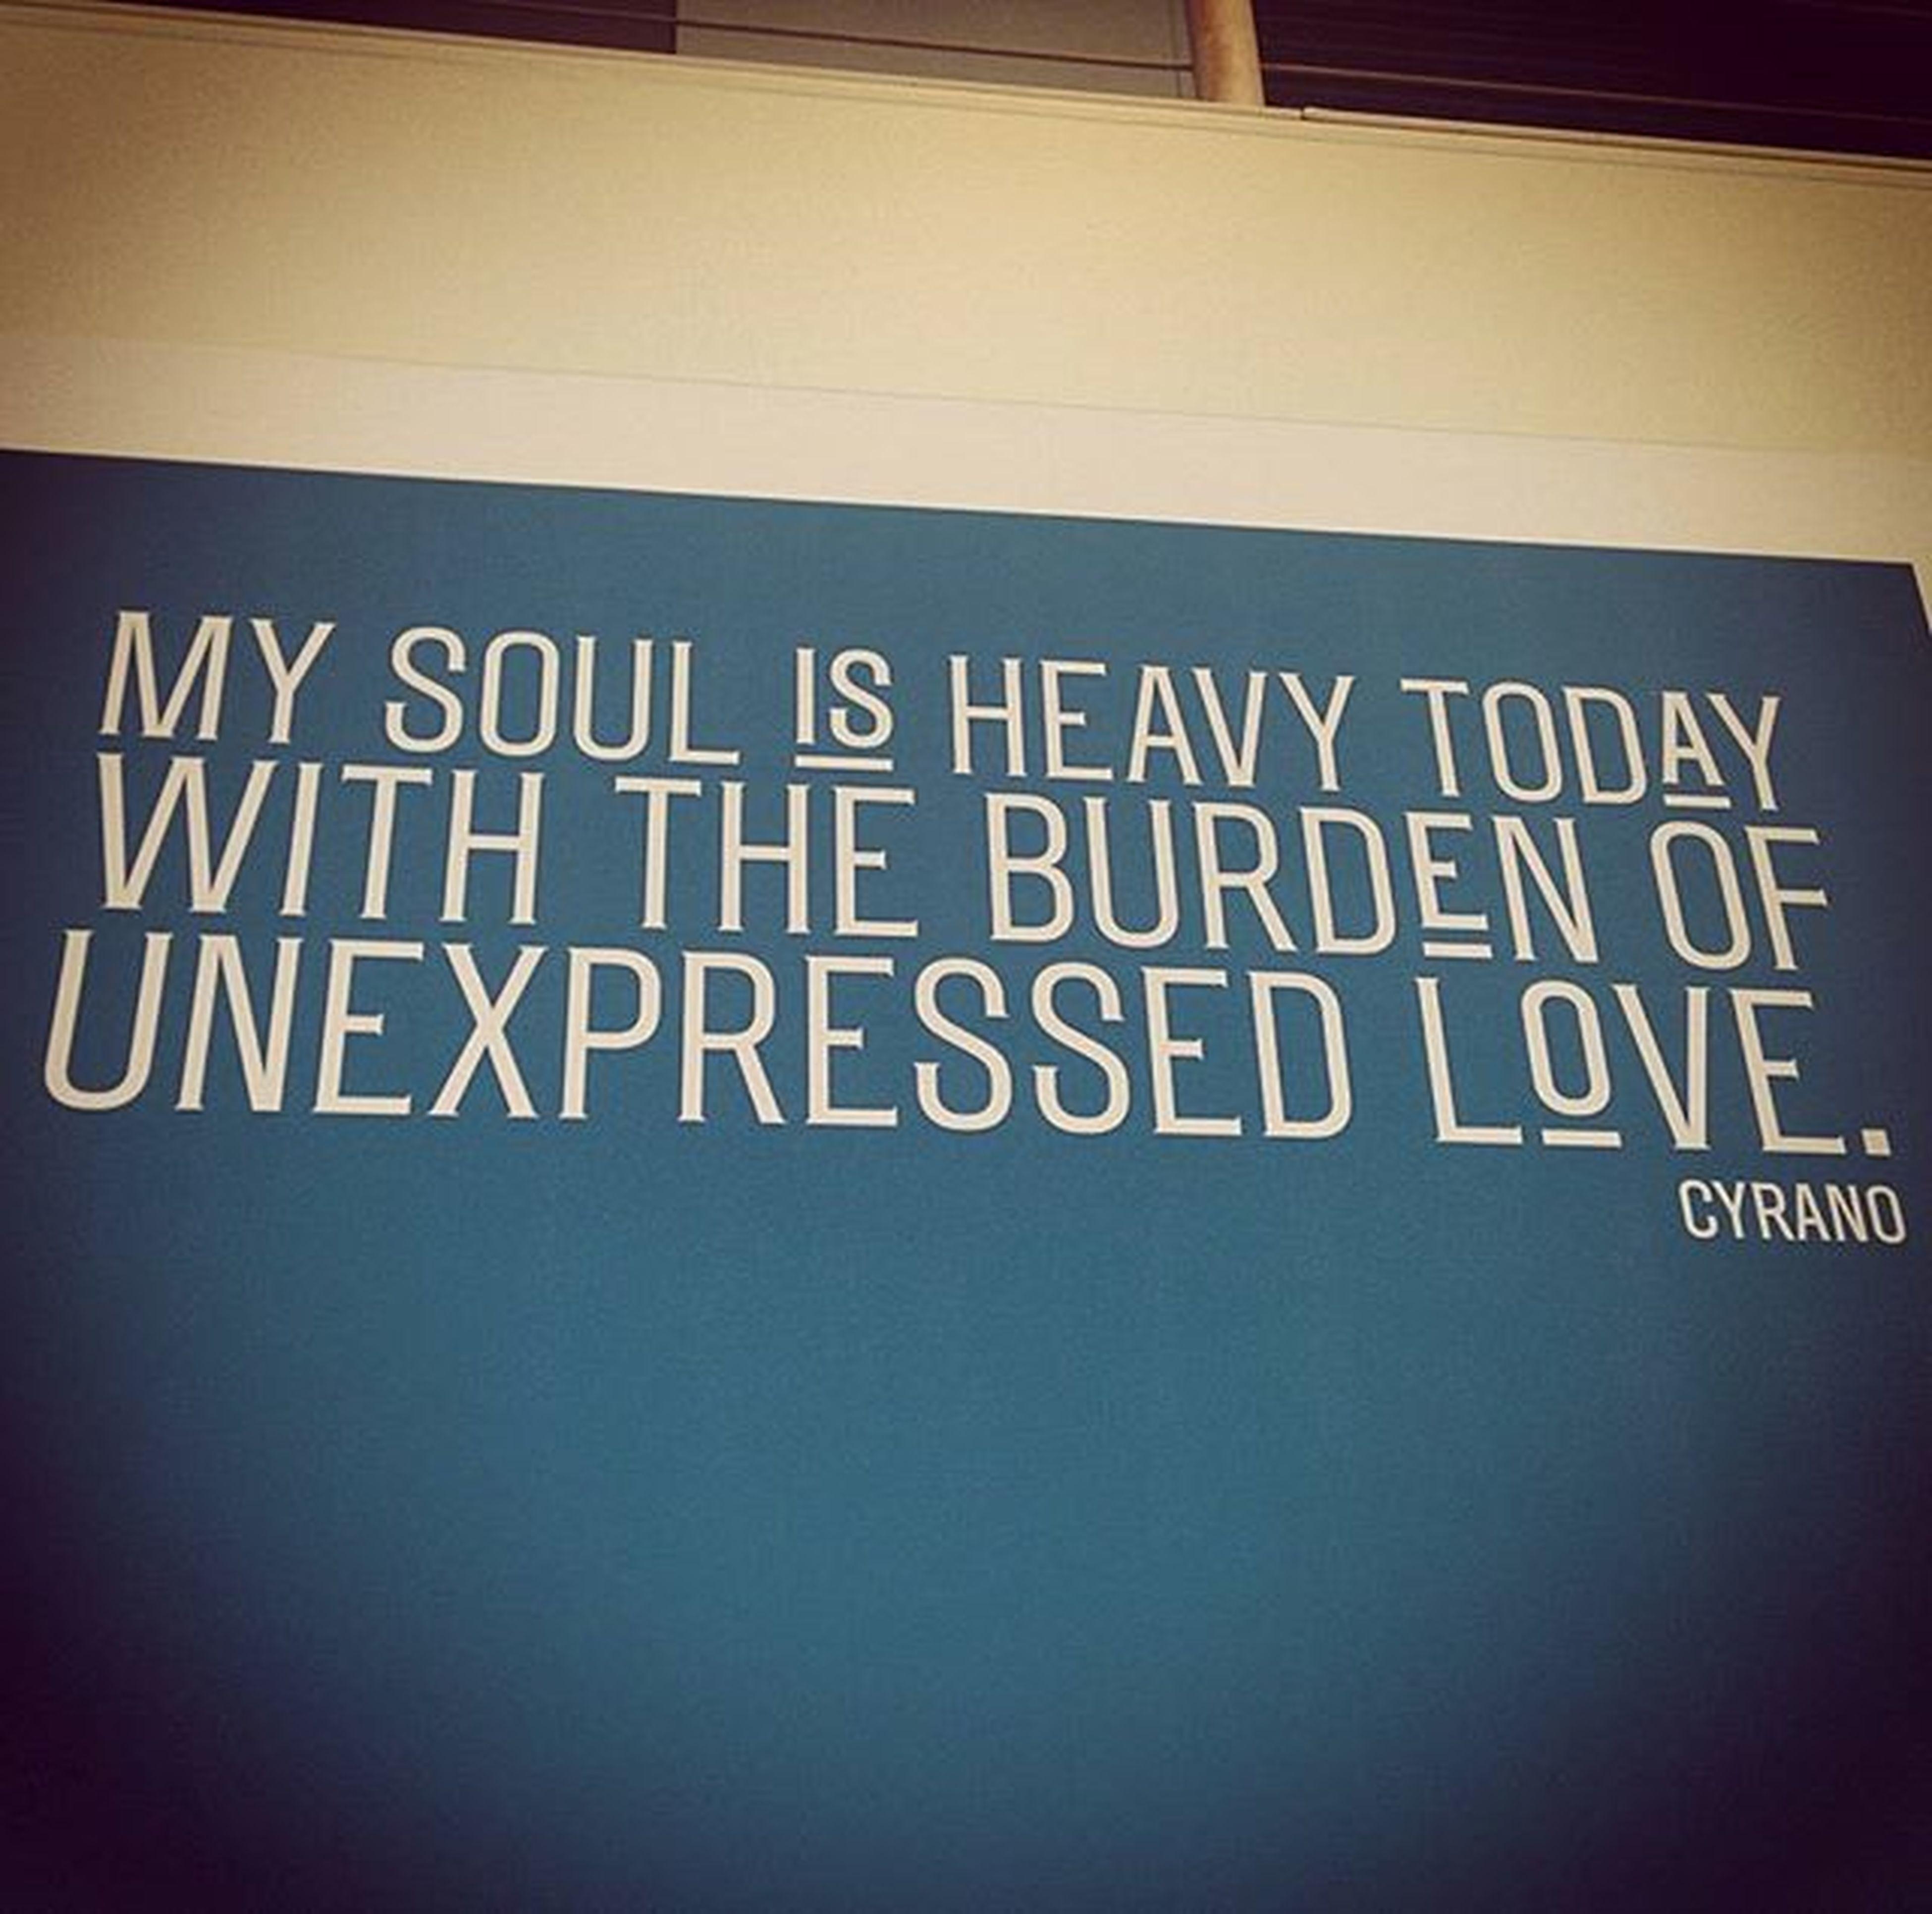 Cyrano Quote Qotd Unexpressedlove Burden Life Love Soul HeavyHeart Heavysoul